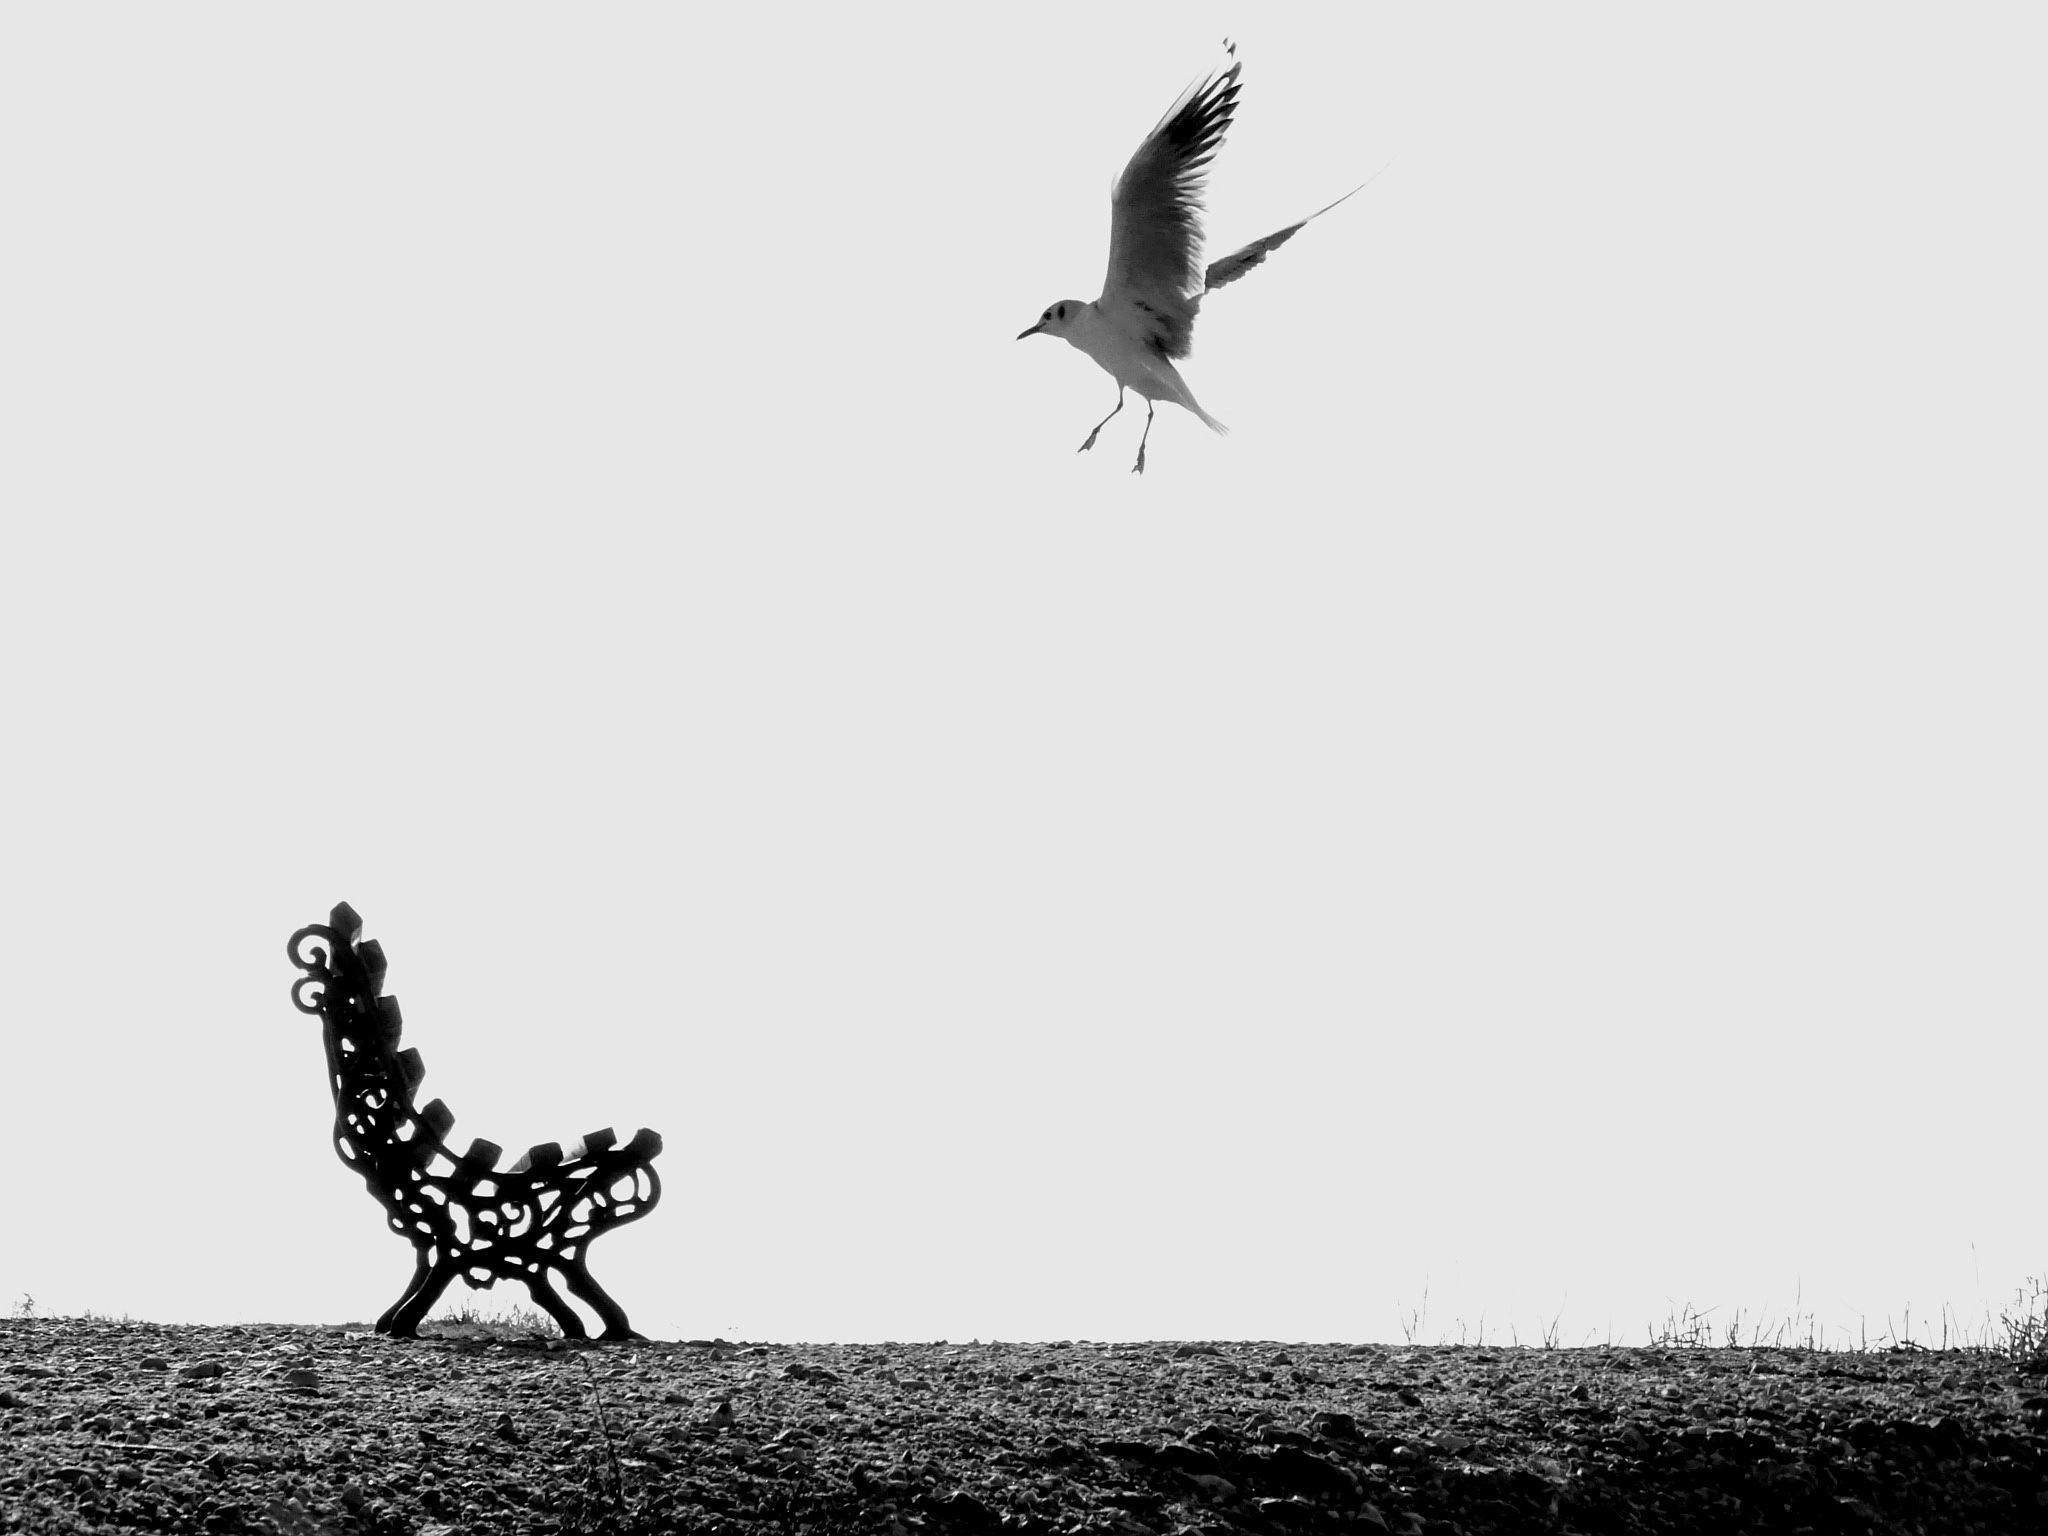 gull & bench by EL Greco